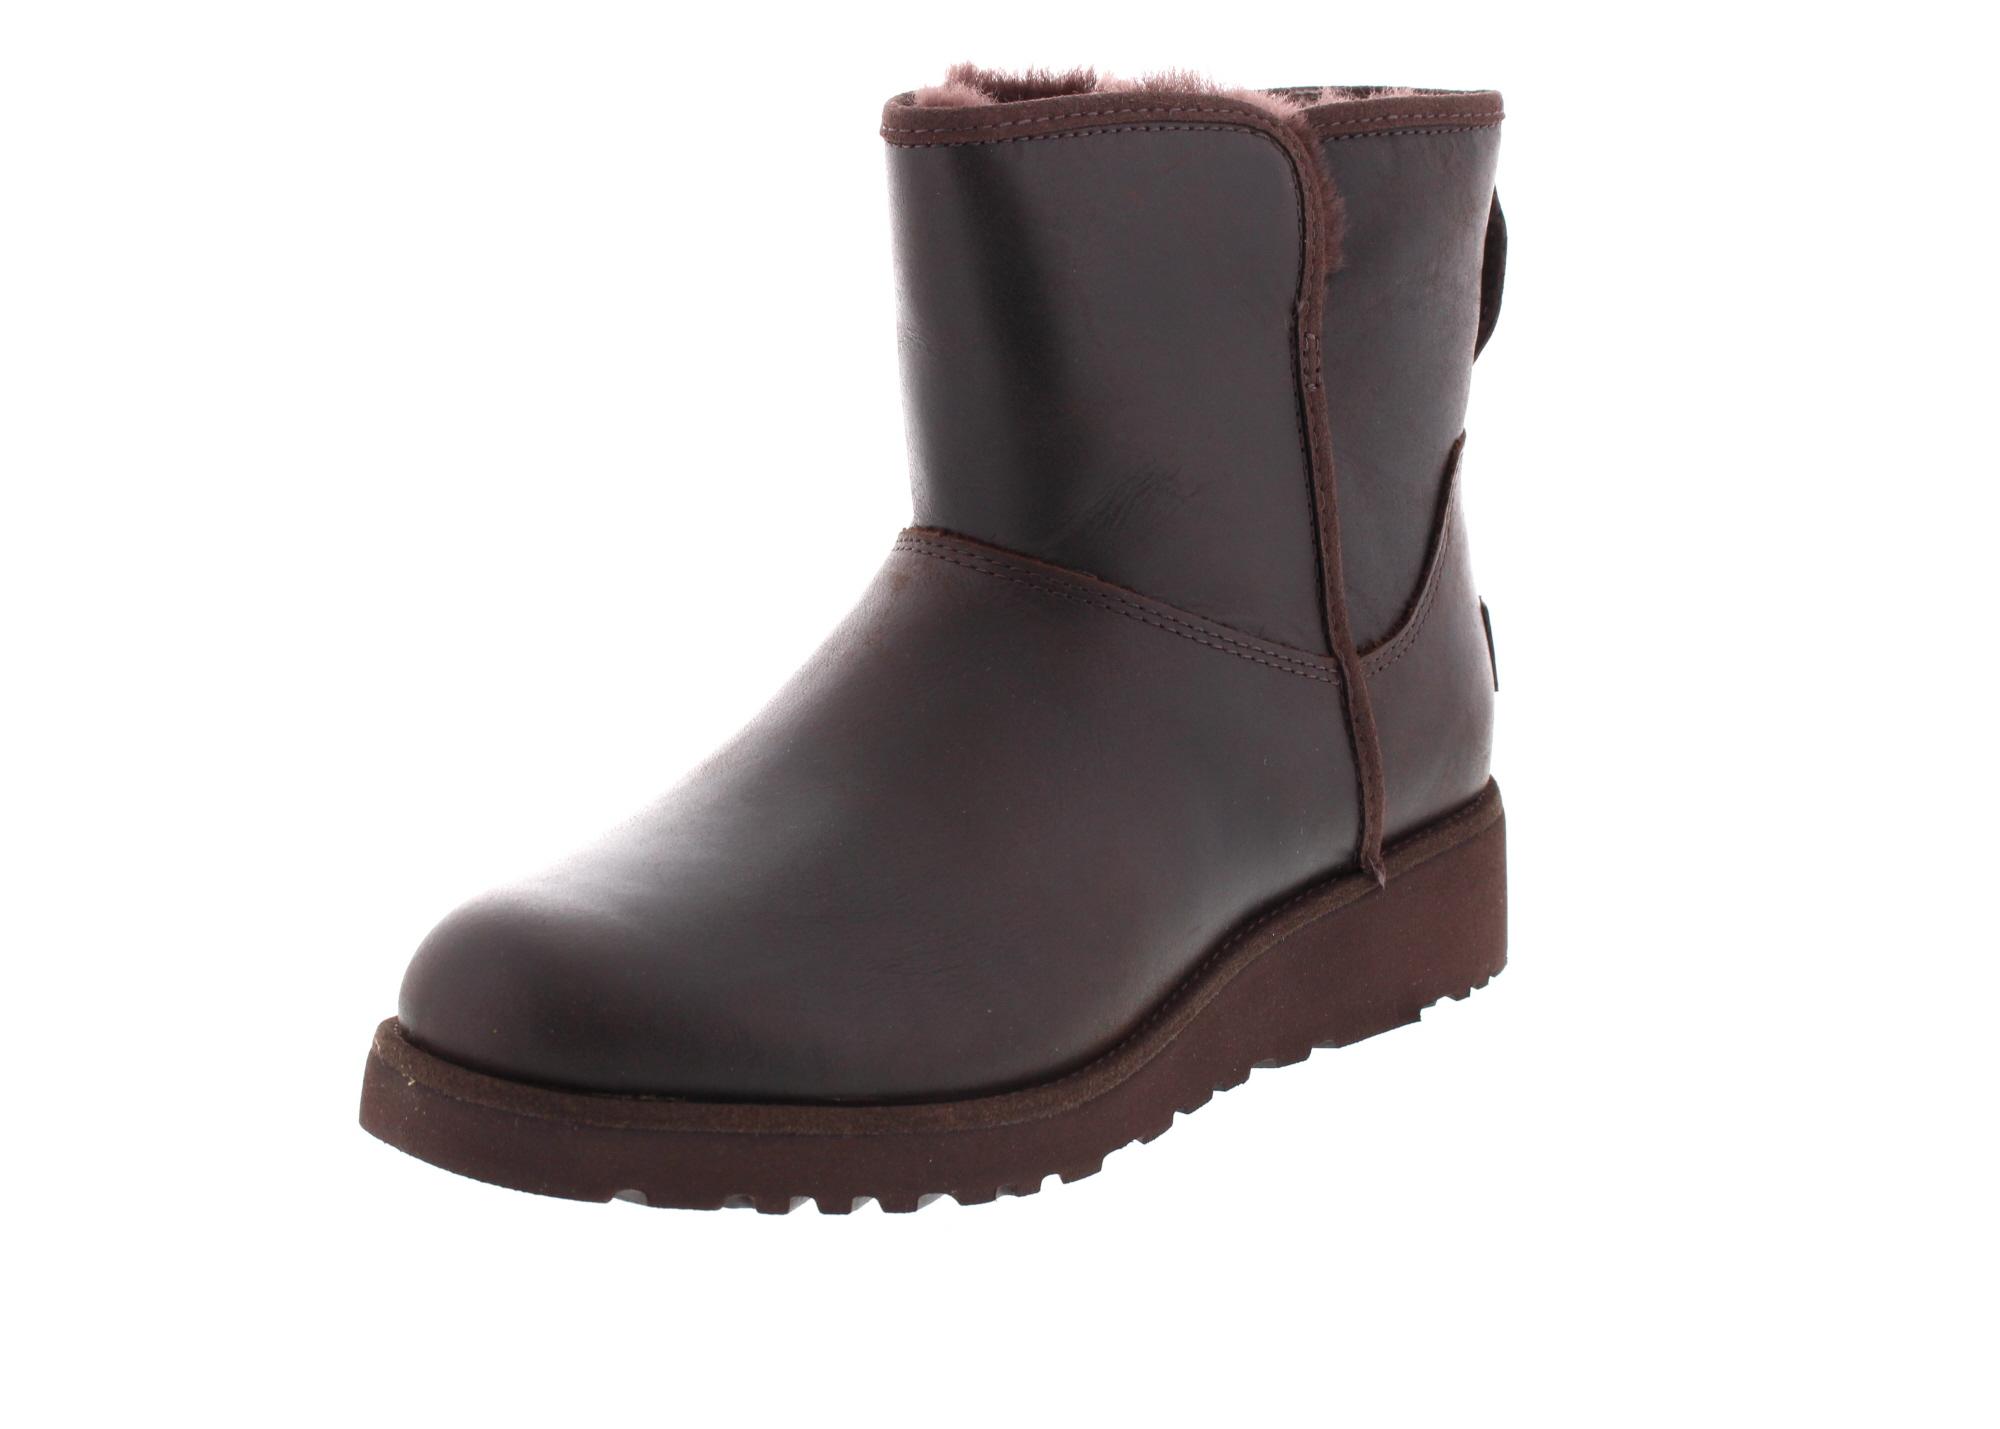 UGG Damenschuhe - Stiefelette KRISTIN Leather - stout_0